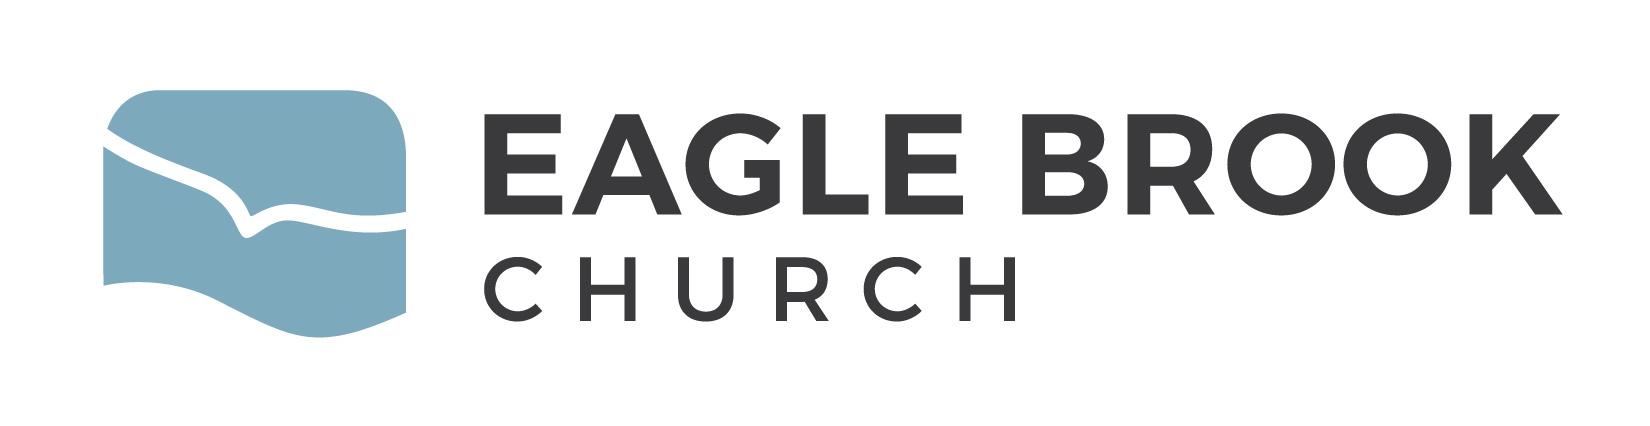 Eagle Brook Church - Blaine Campus